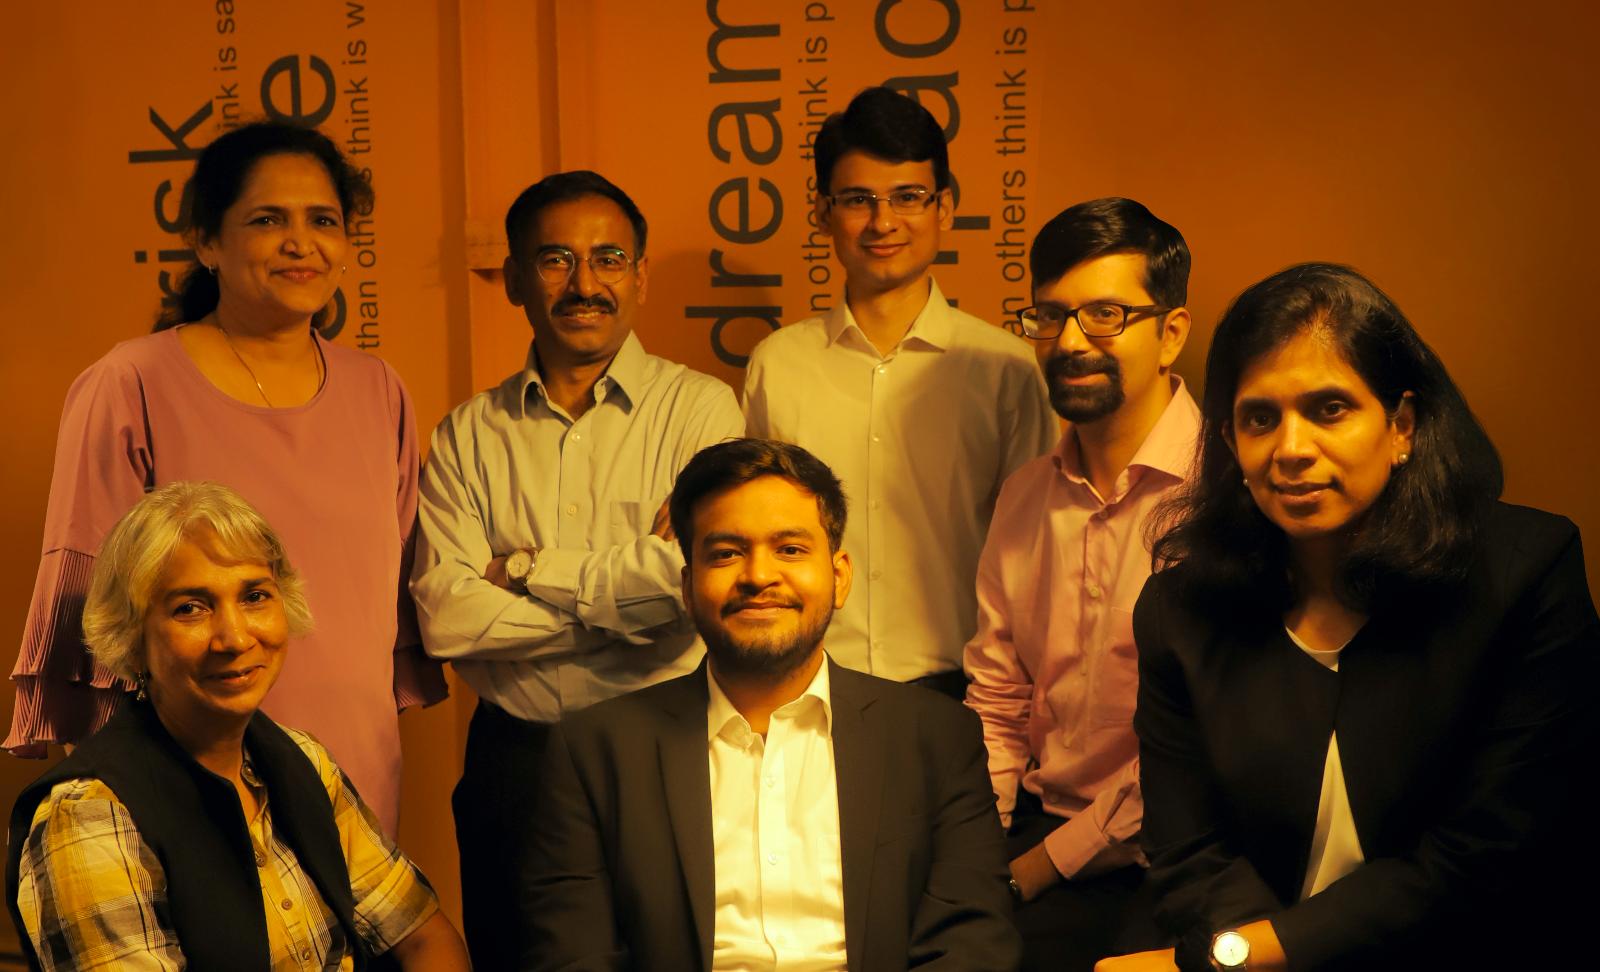 Rema Subramanian, Ritu Verma, Krishnan Neelakantan, Shiva Shanker, Shreyansh Singhal, Deepak Bhatt, Nikita Anand